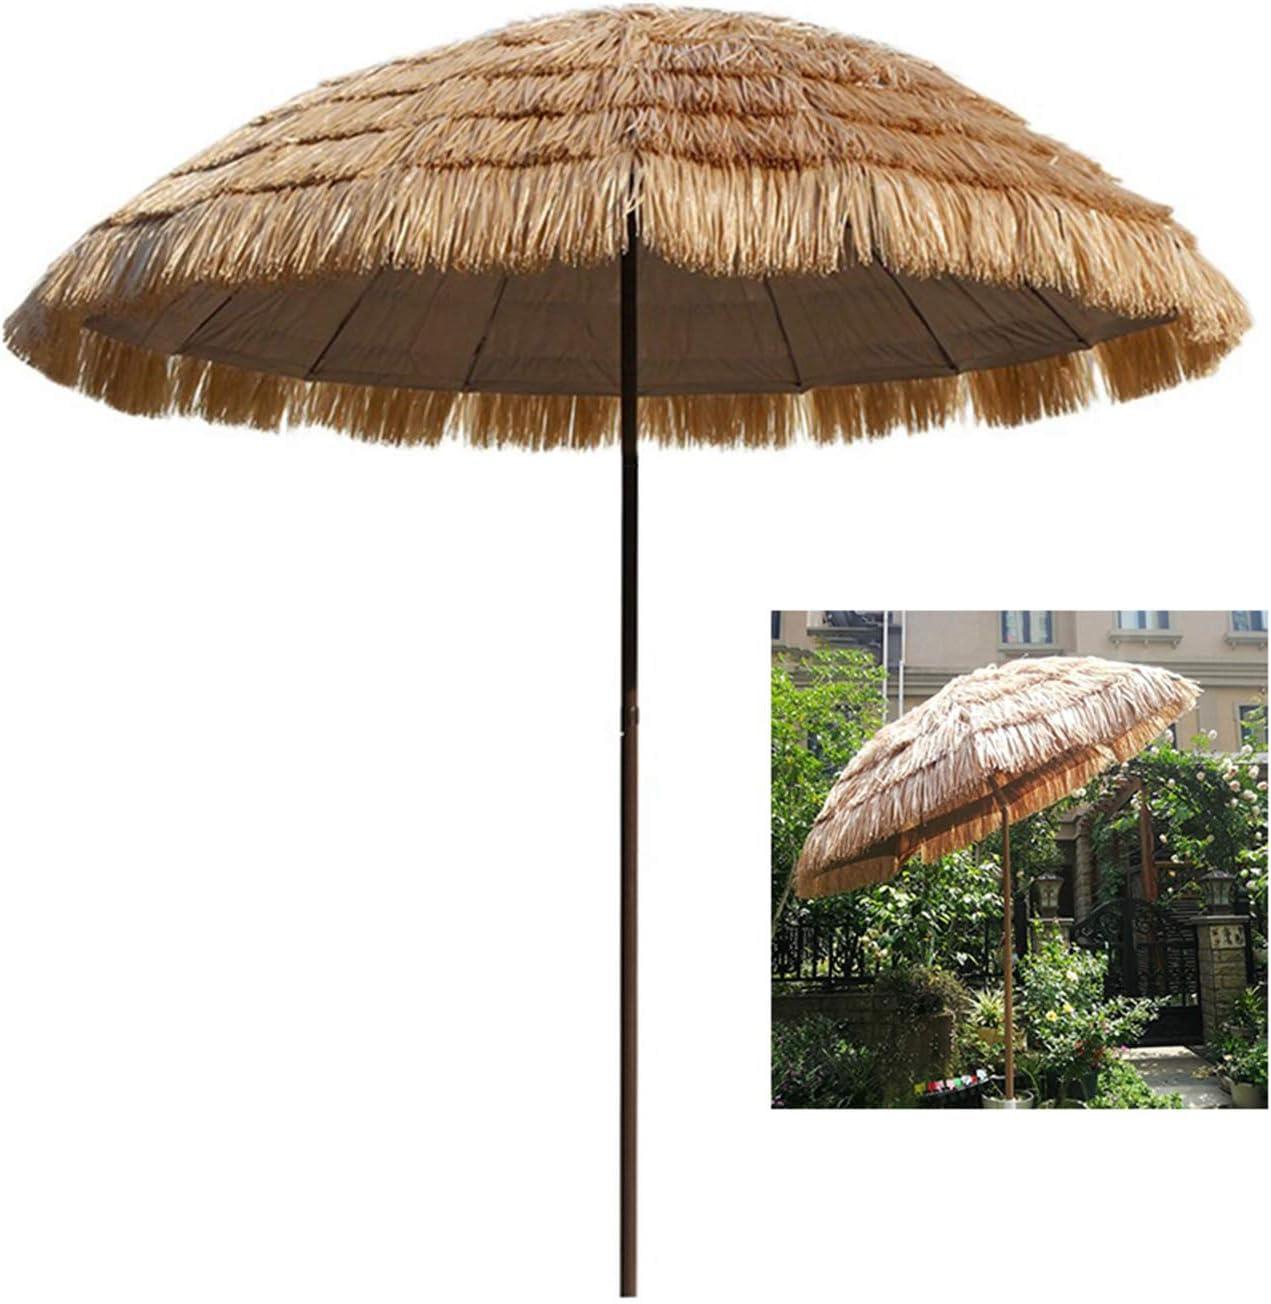 Sonnenschirm Hawaii /Ø 200cm,Strandschirm Gartenschirm Balkonschirm strohschirm Sonnenschutz neigbar Outdoor Reise Camping Deck